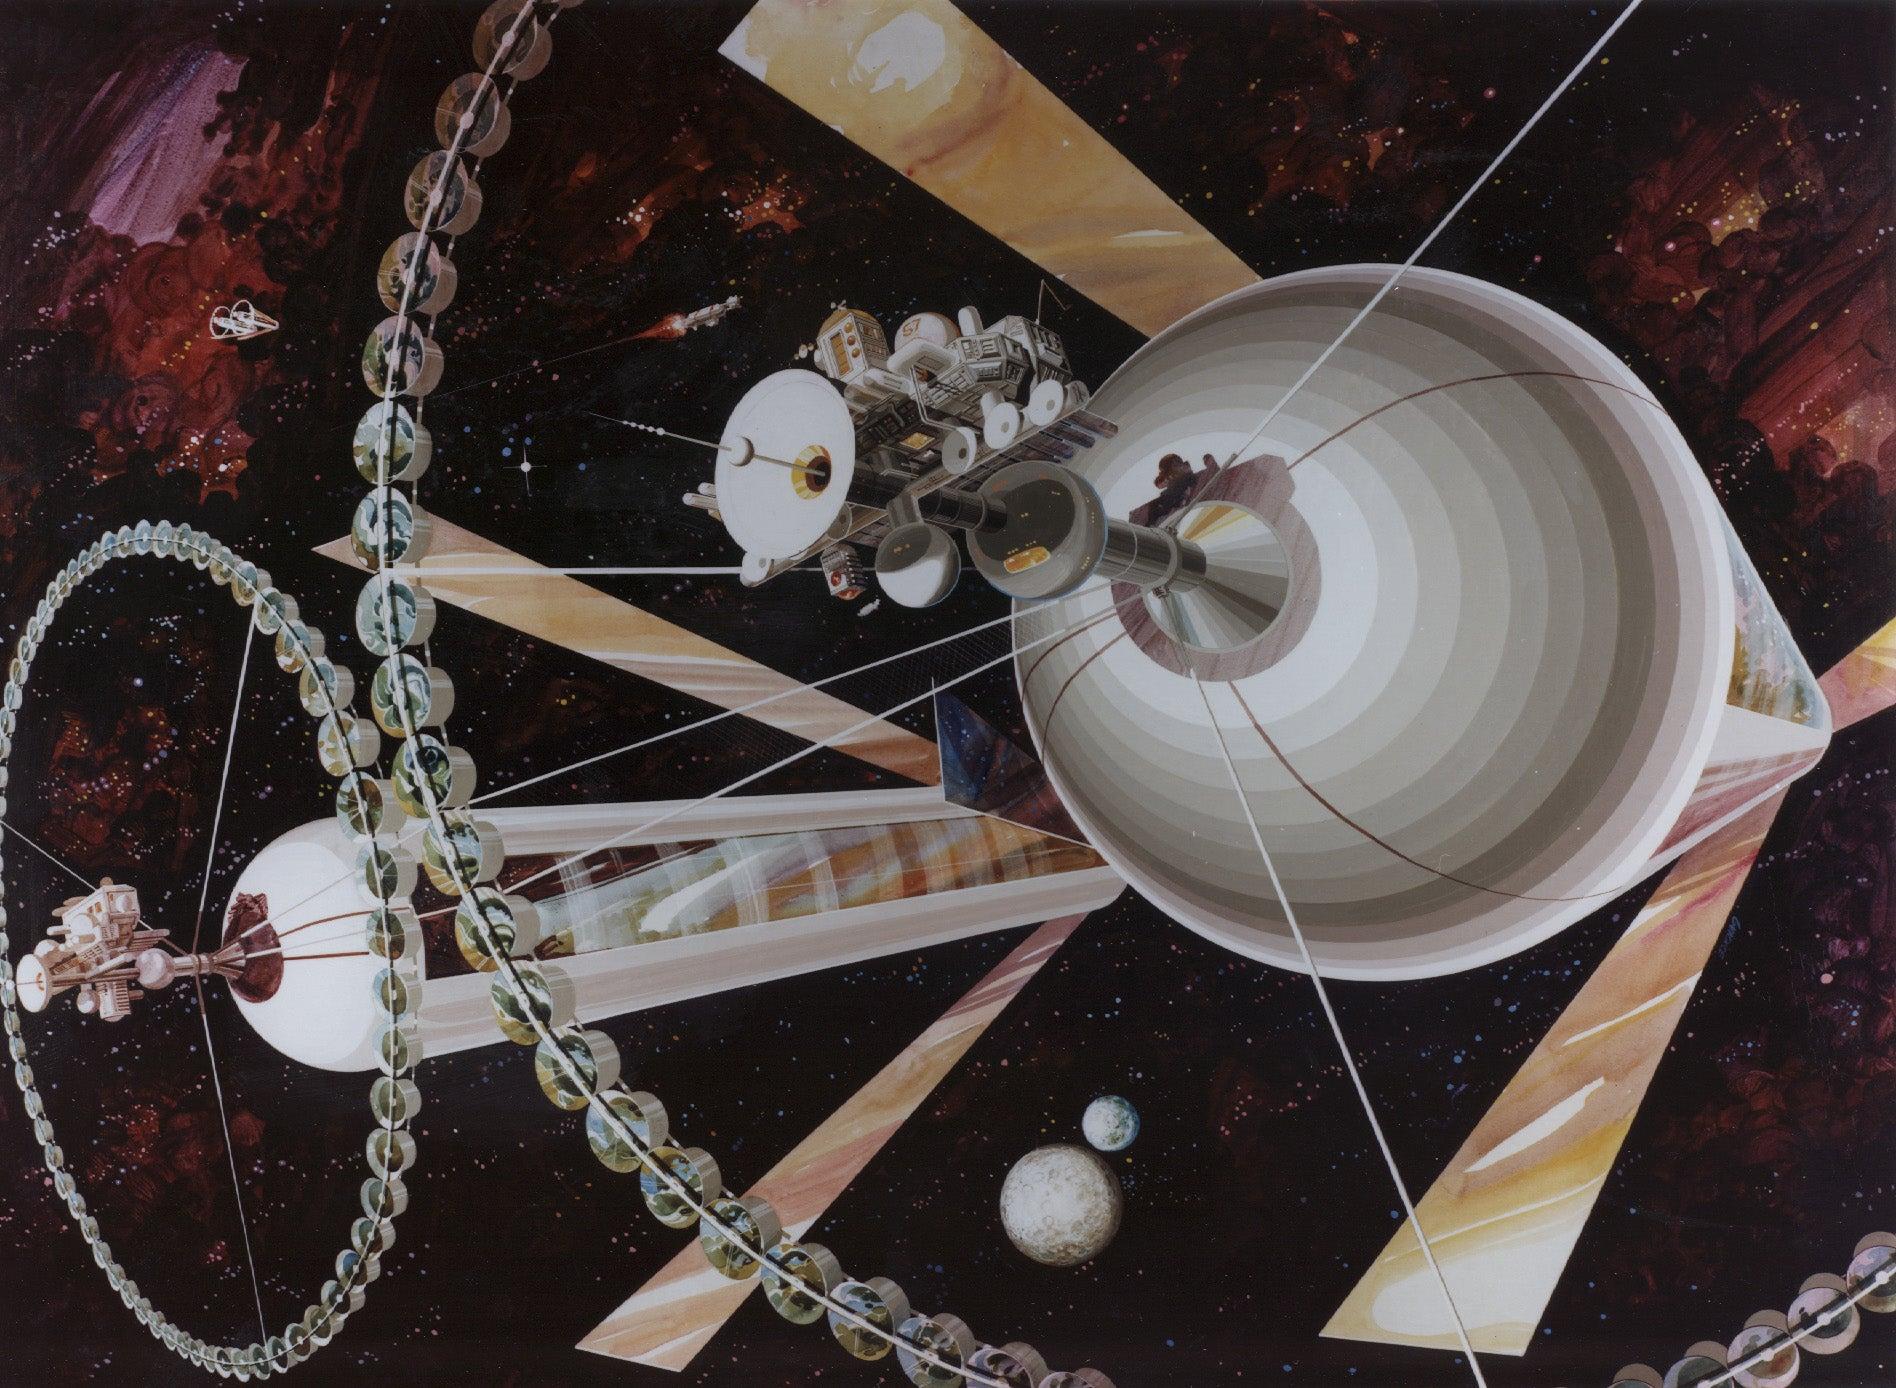 Interstellar Travel Won't Look Anything Like The Movie